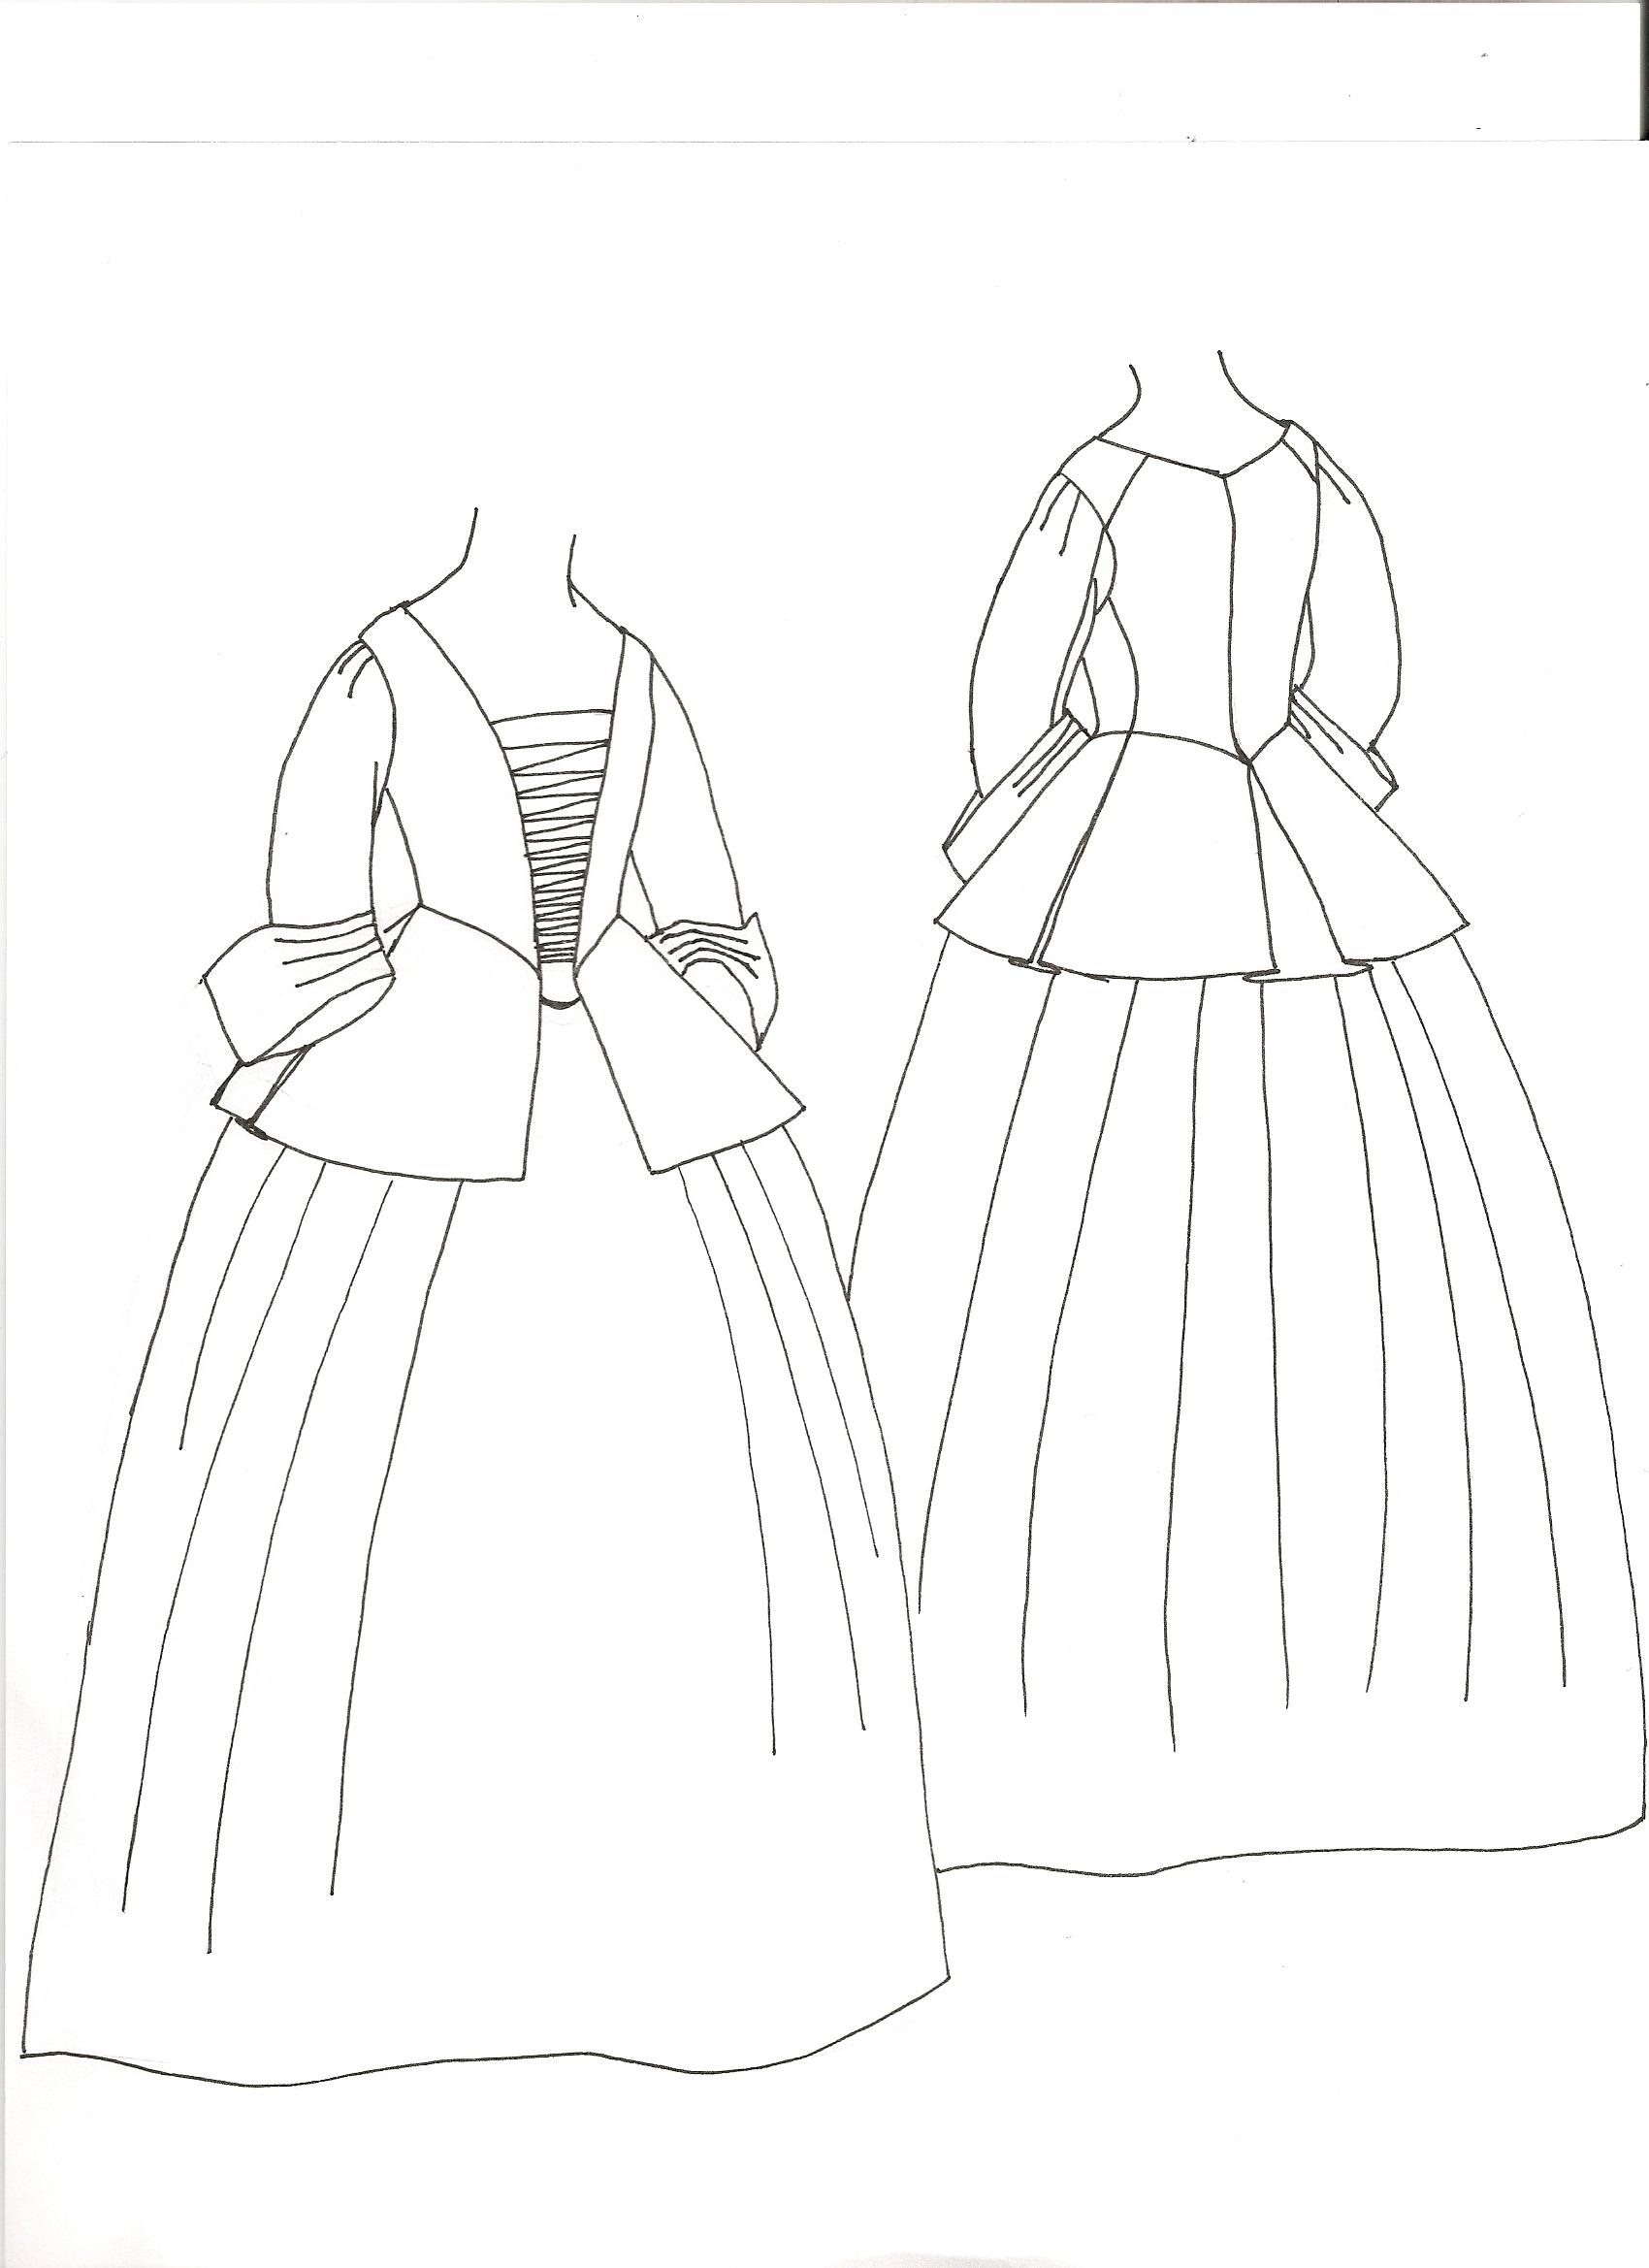 Calico Jacket And Petticoat